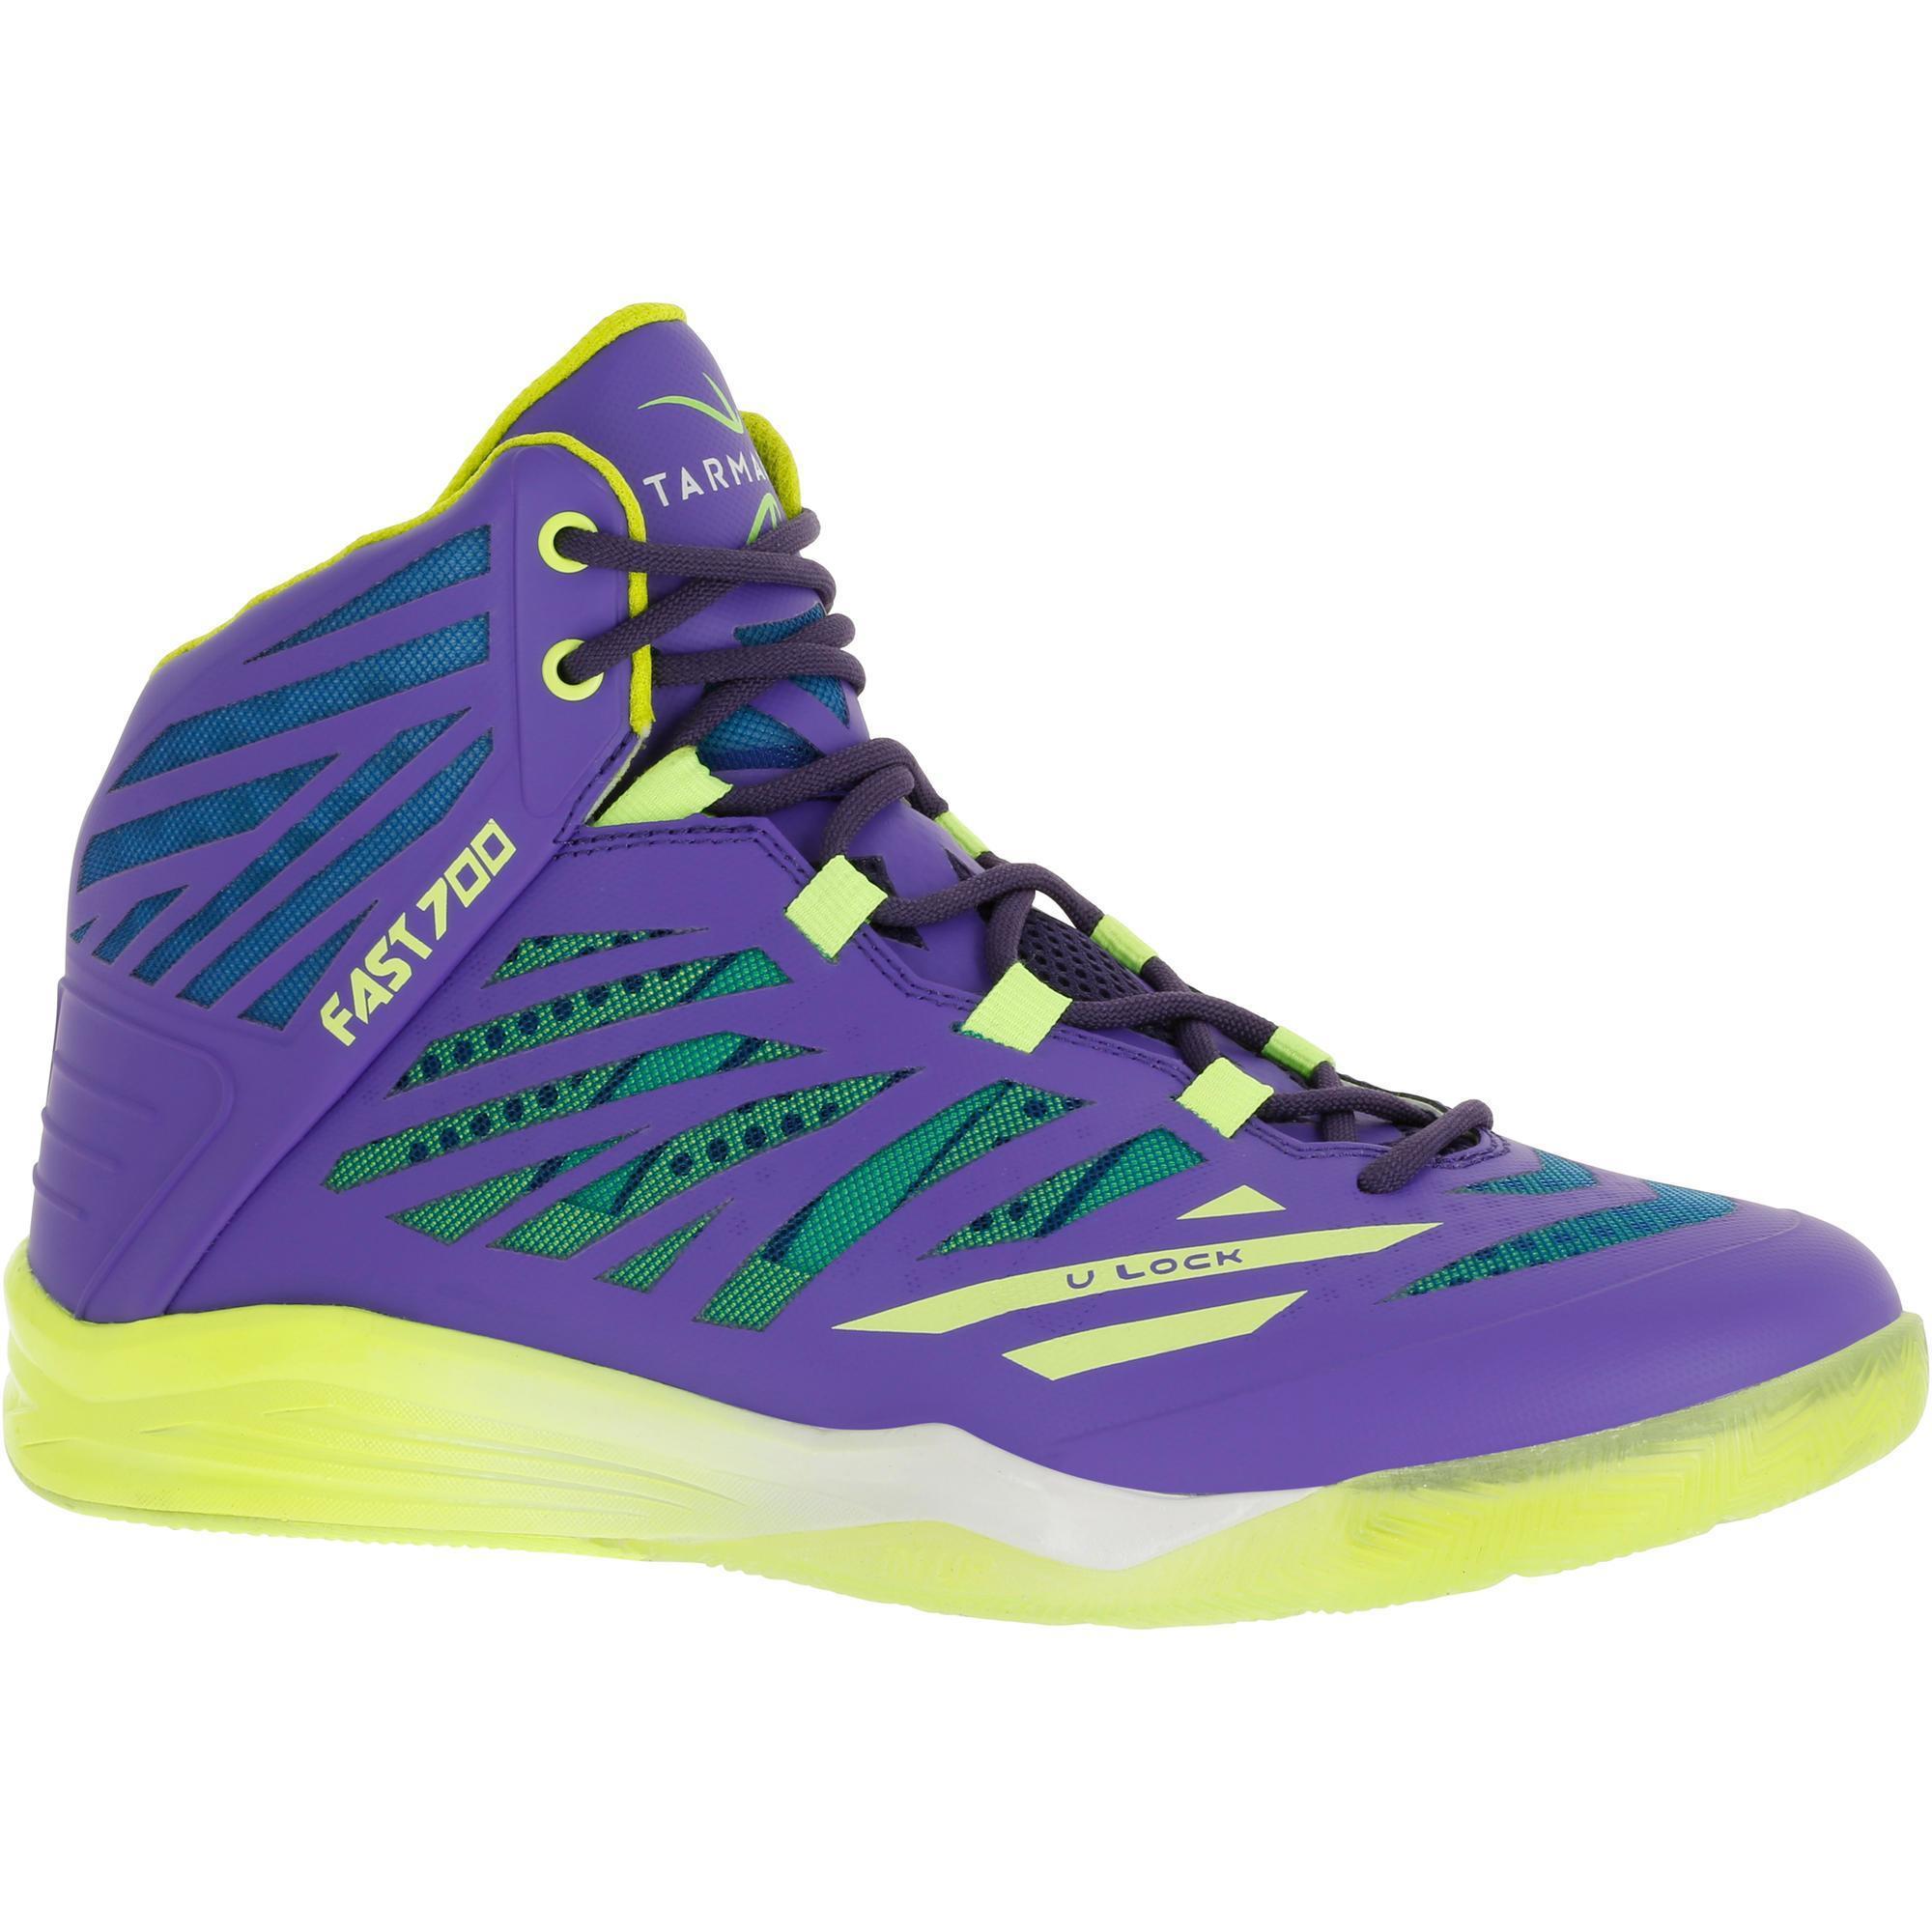 b9f59ada4857d adult shoes - Decathlon